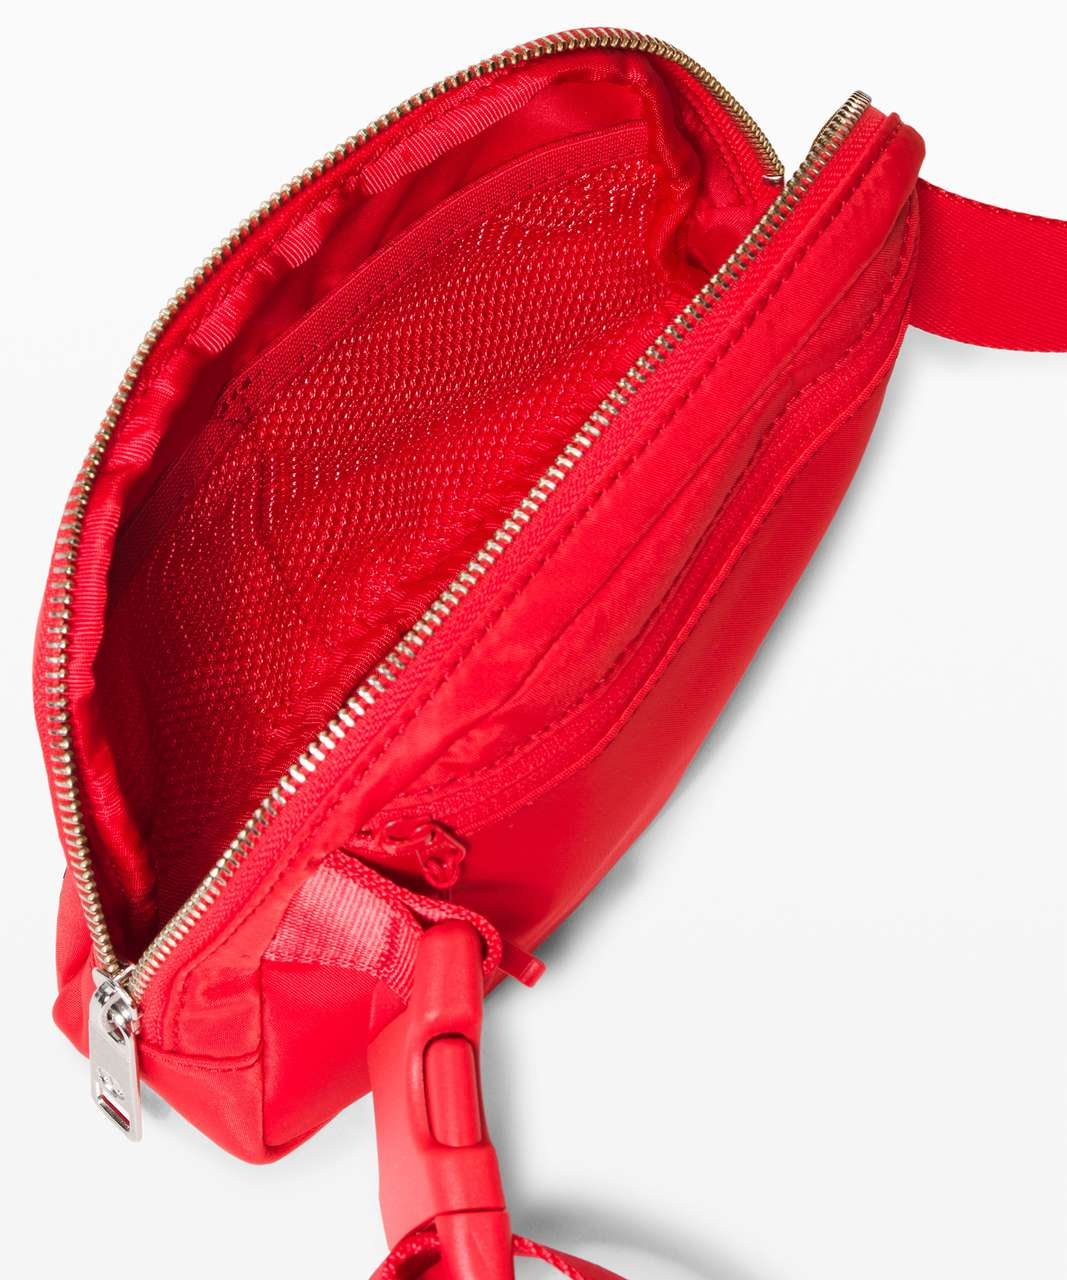 Lululemon Everywhere Belt Bag *1L - Carnation Red